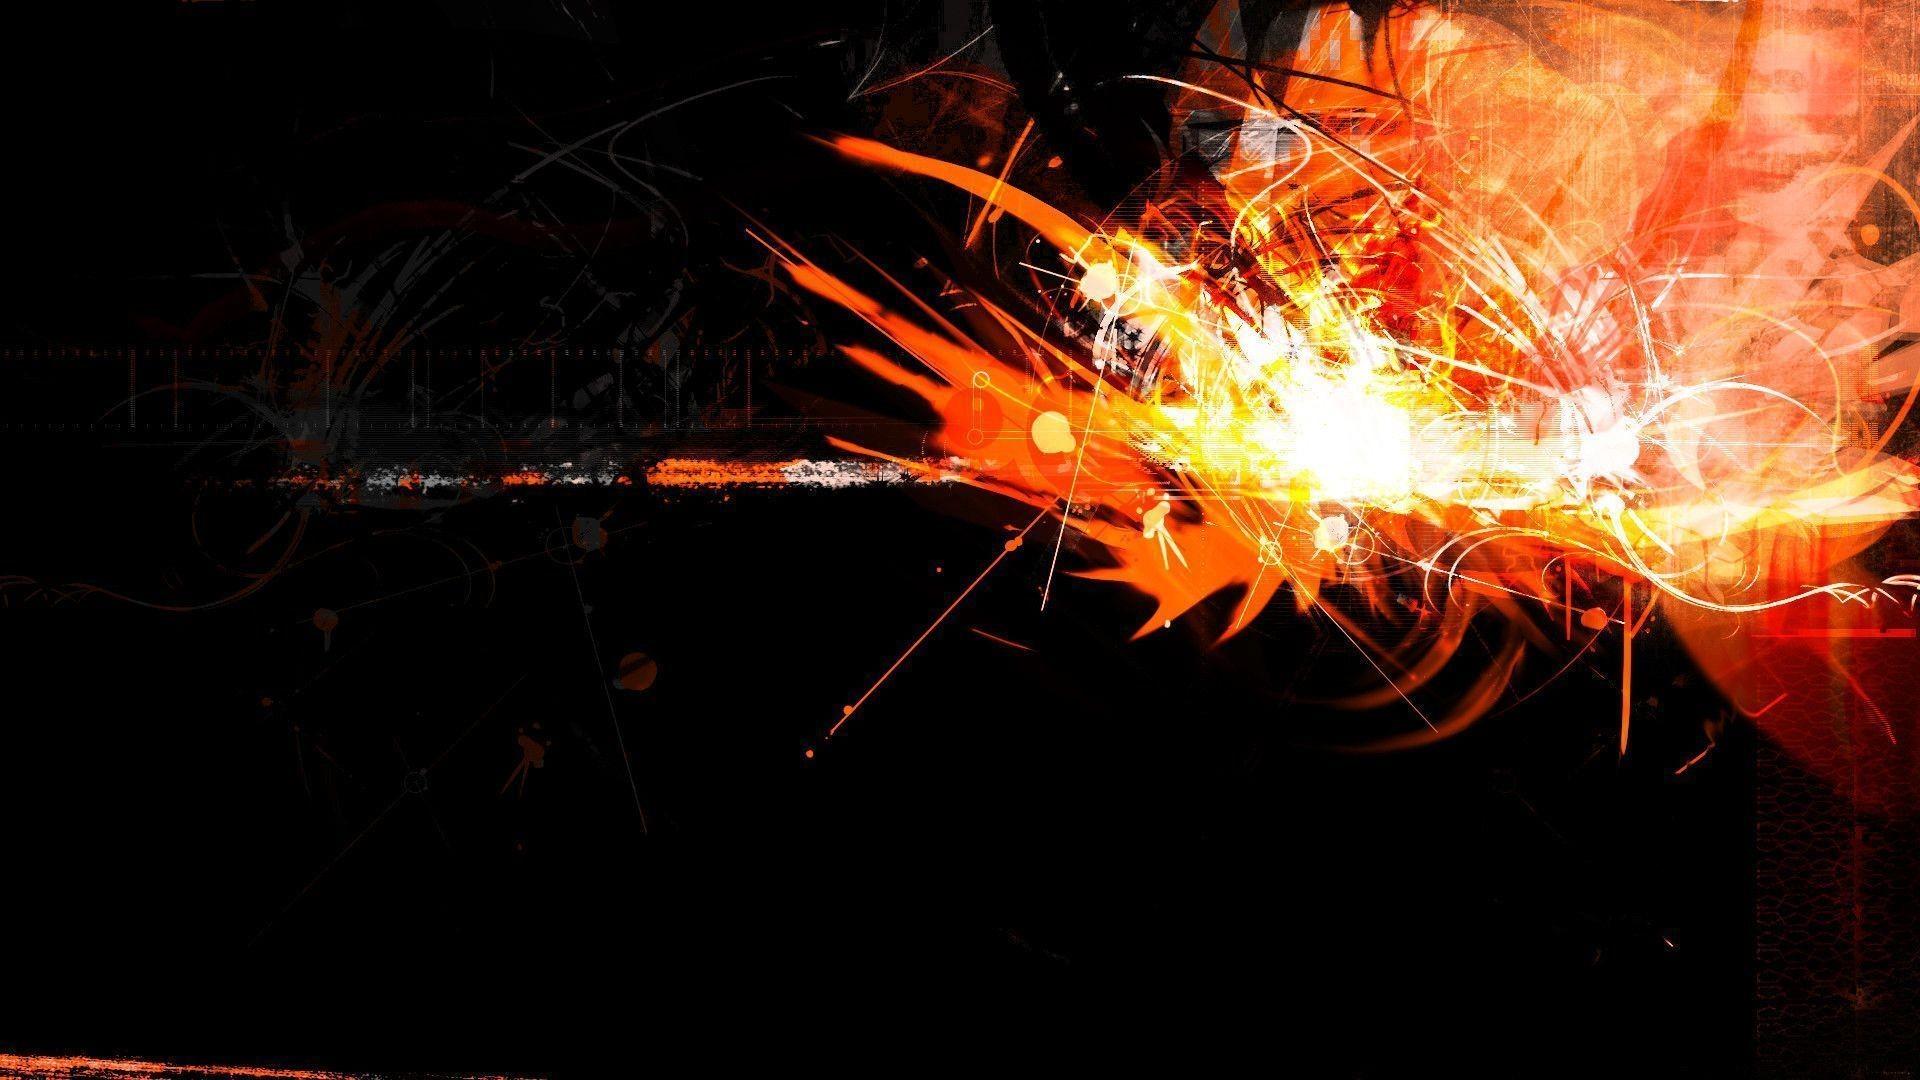 Res: 1920x1080, orange-black-wallpaper-44056-hd-wallpapers-background.jpg